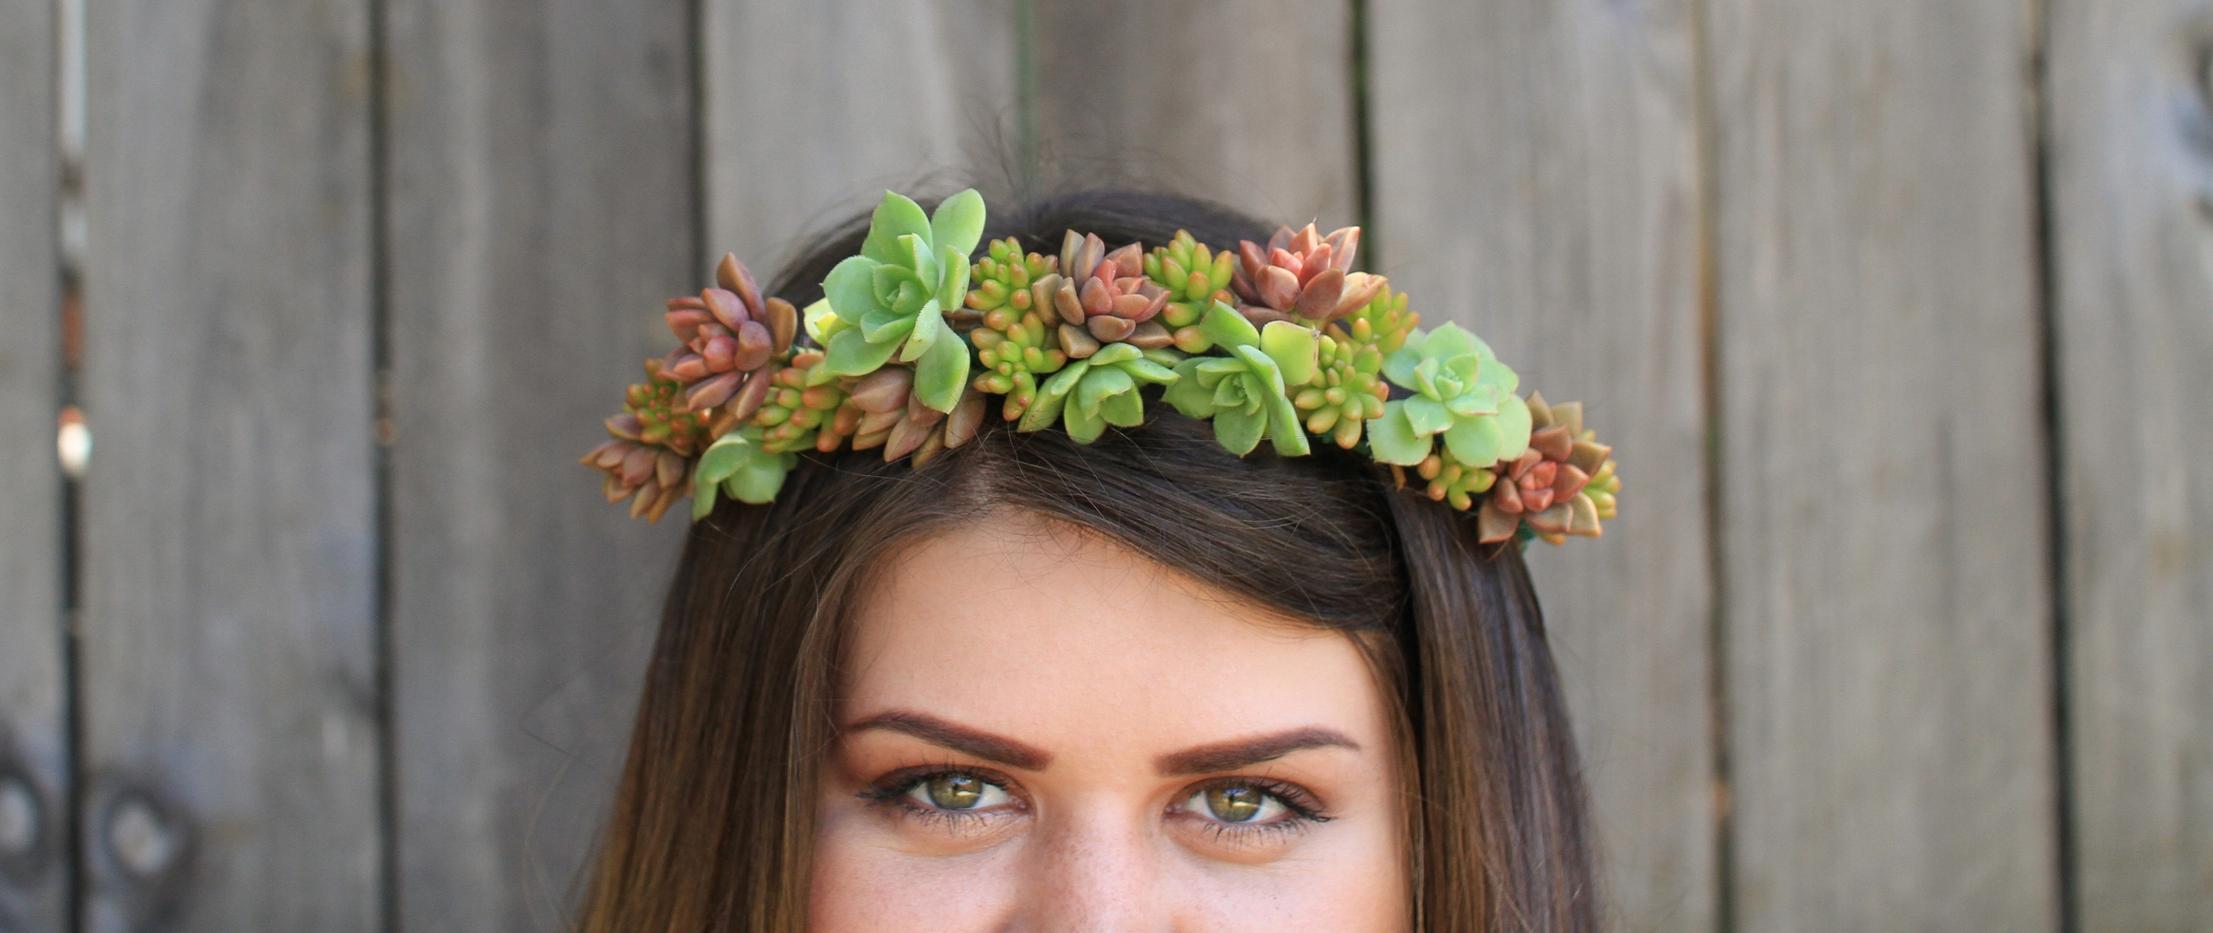 succulent-crown-succulents-maternity-photography-tayia-rae-photos-needlesandleaves_net.jpg